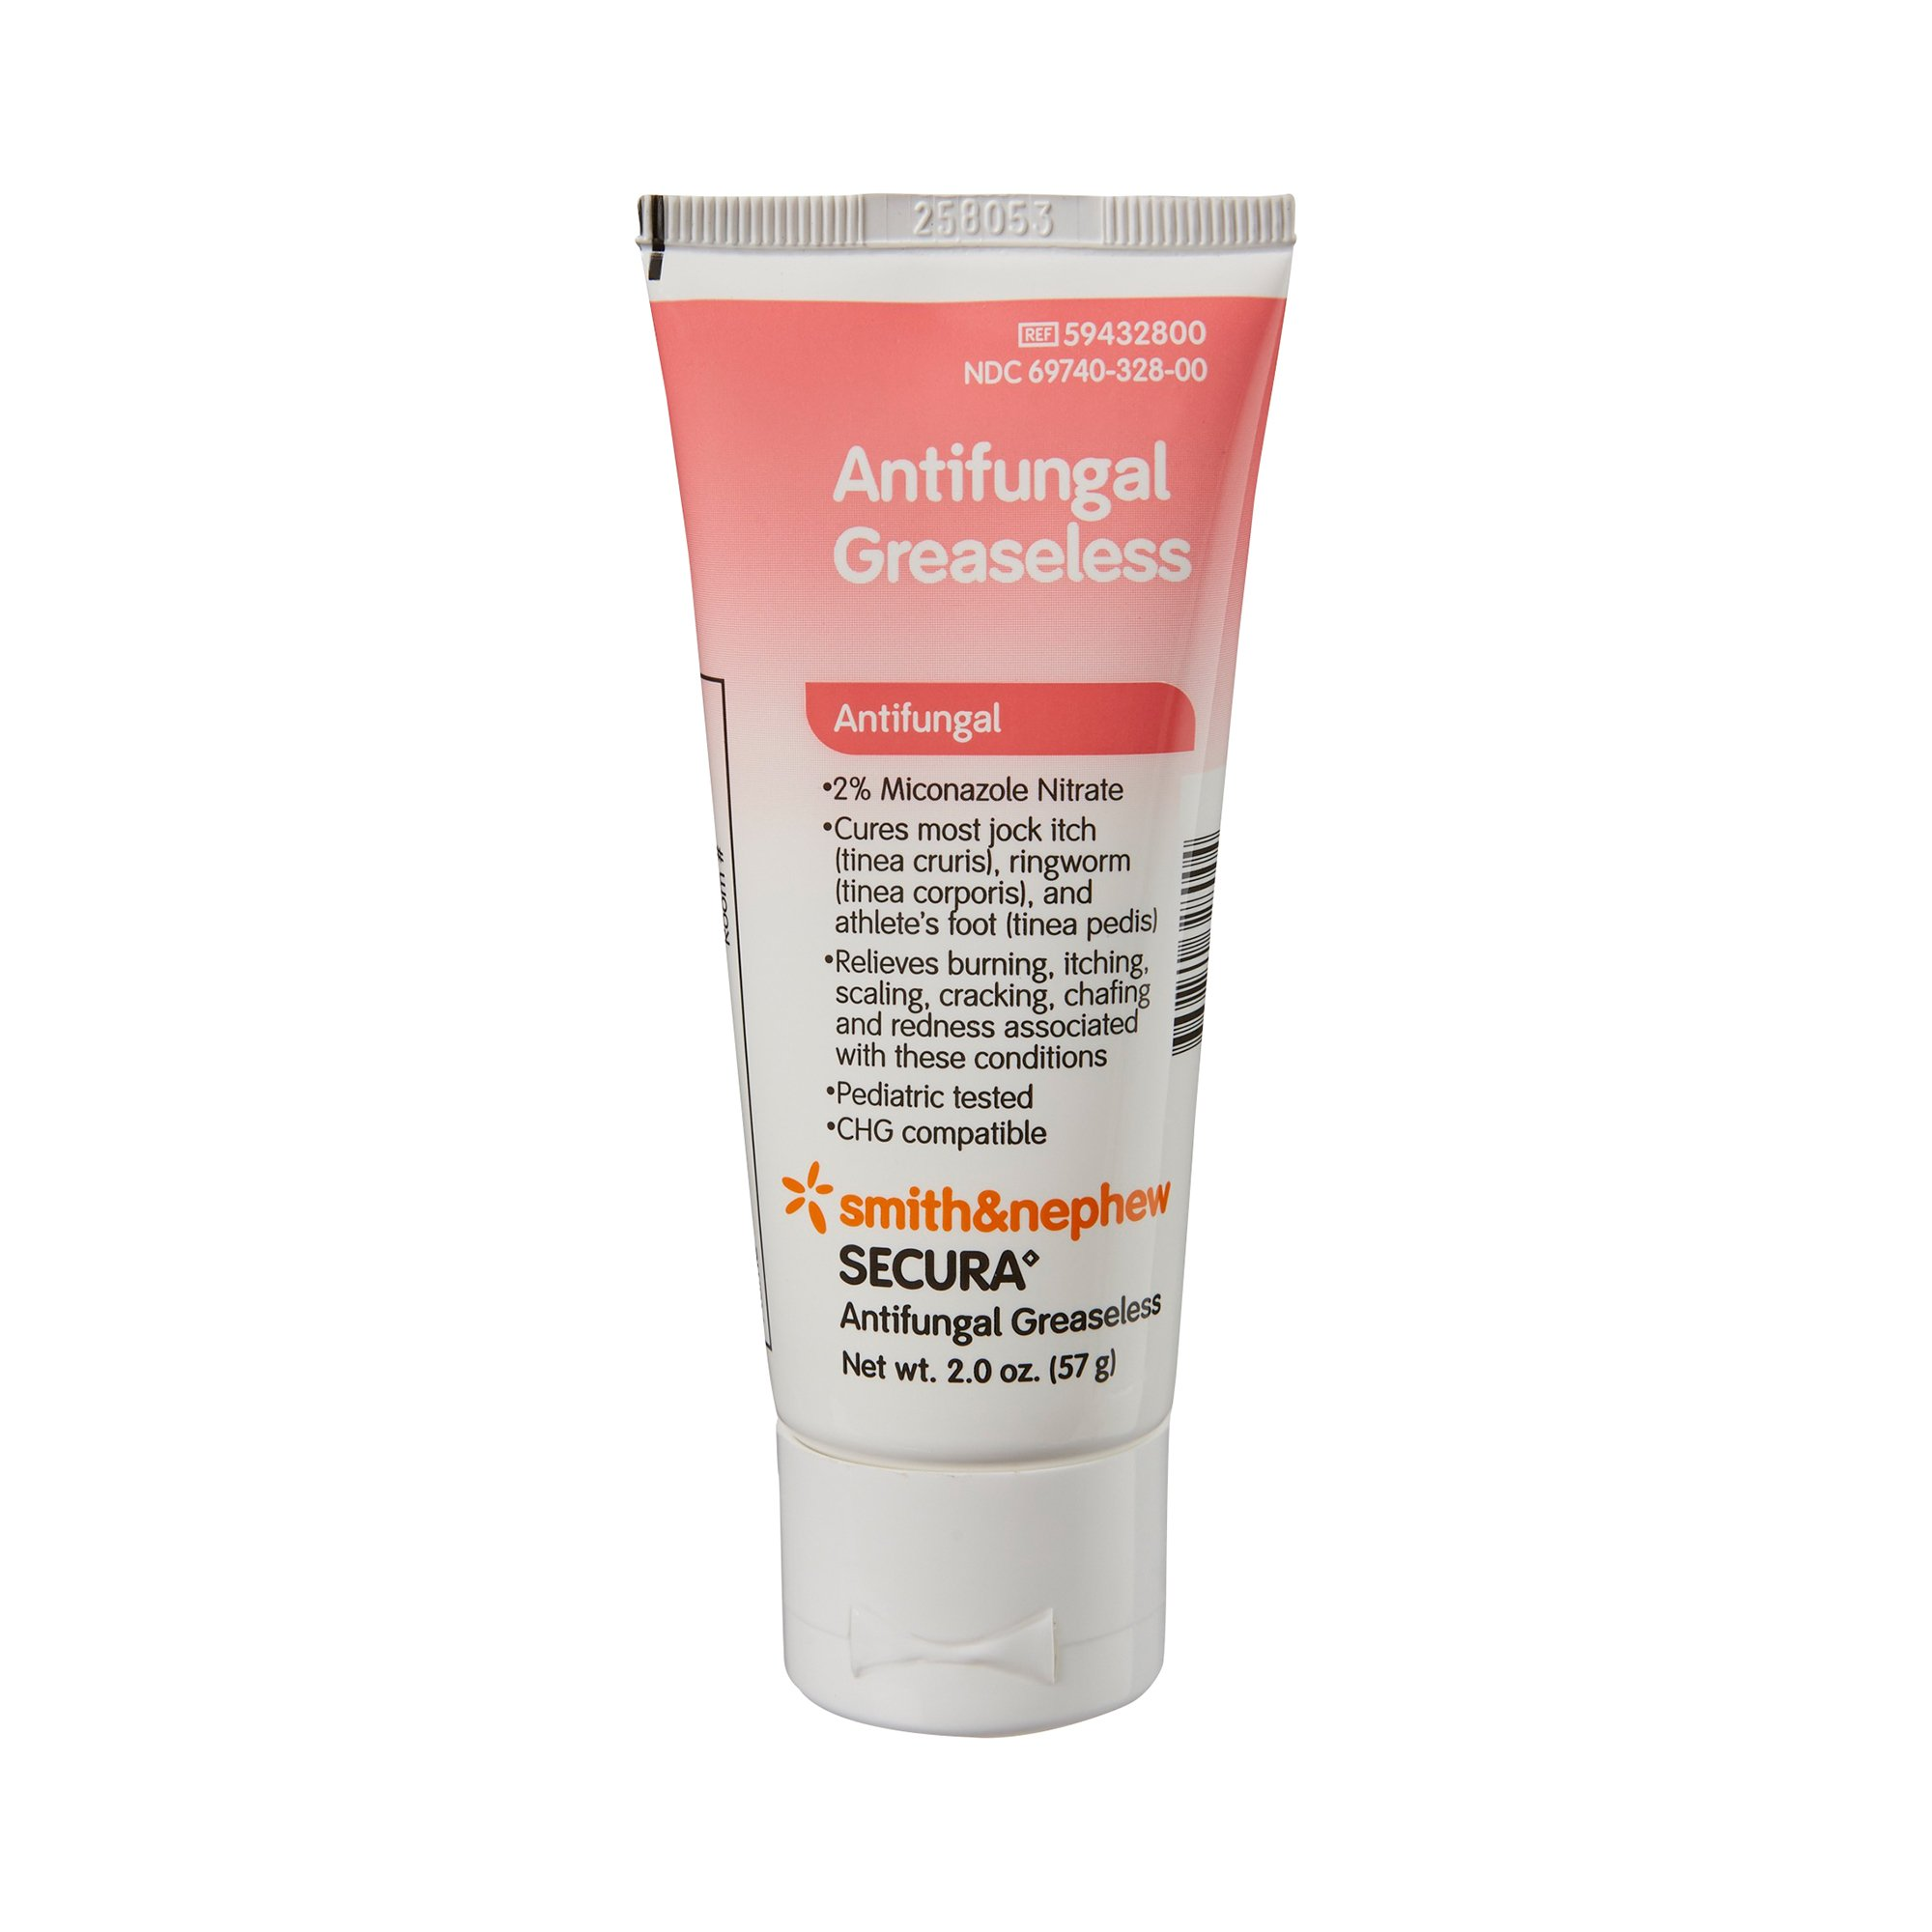 Secura Antifungal Greaseless Cream, 59432800, 2 oz. - Case of 12